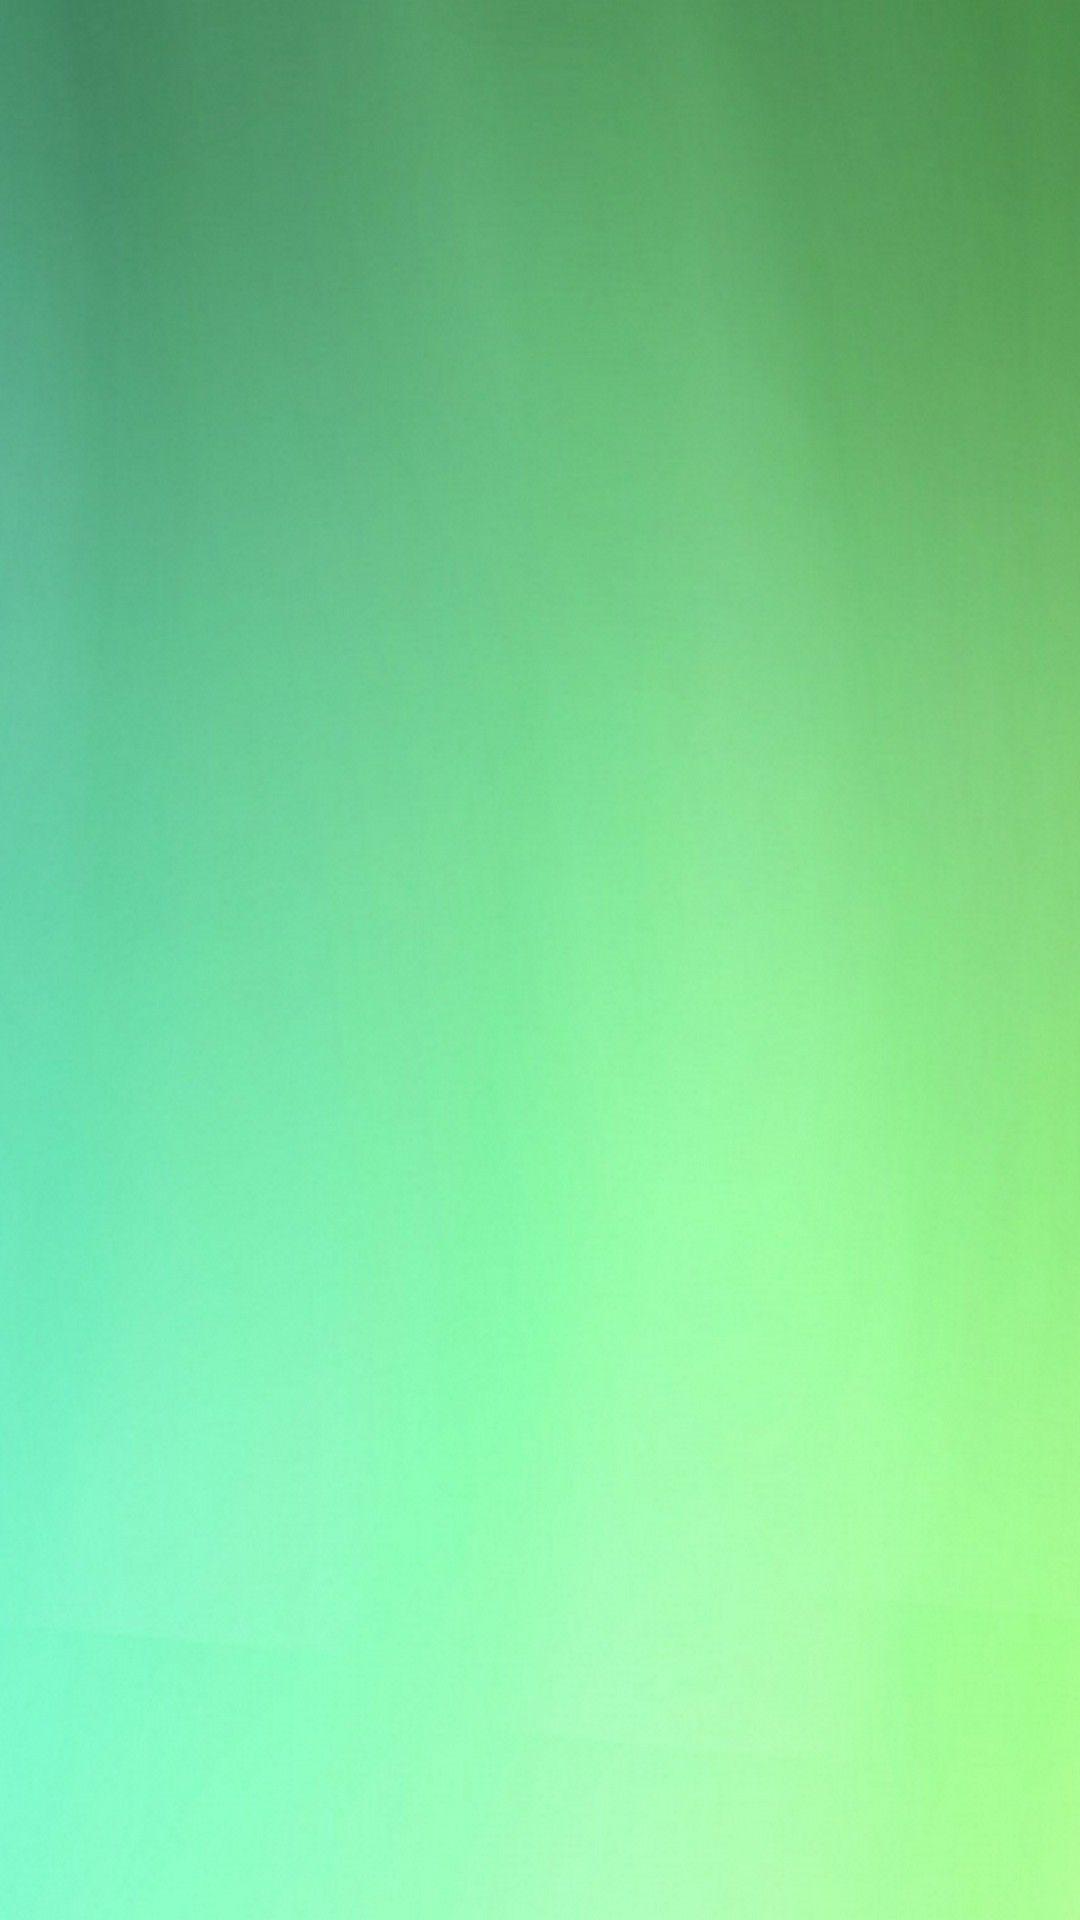 Light Green Wallpaper Android Best Mobile Wallpaper Ombre Wallpapers Striped Wallpaper Iphone Wallpaper